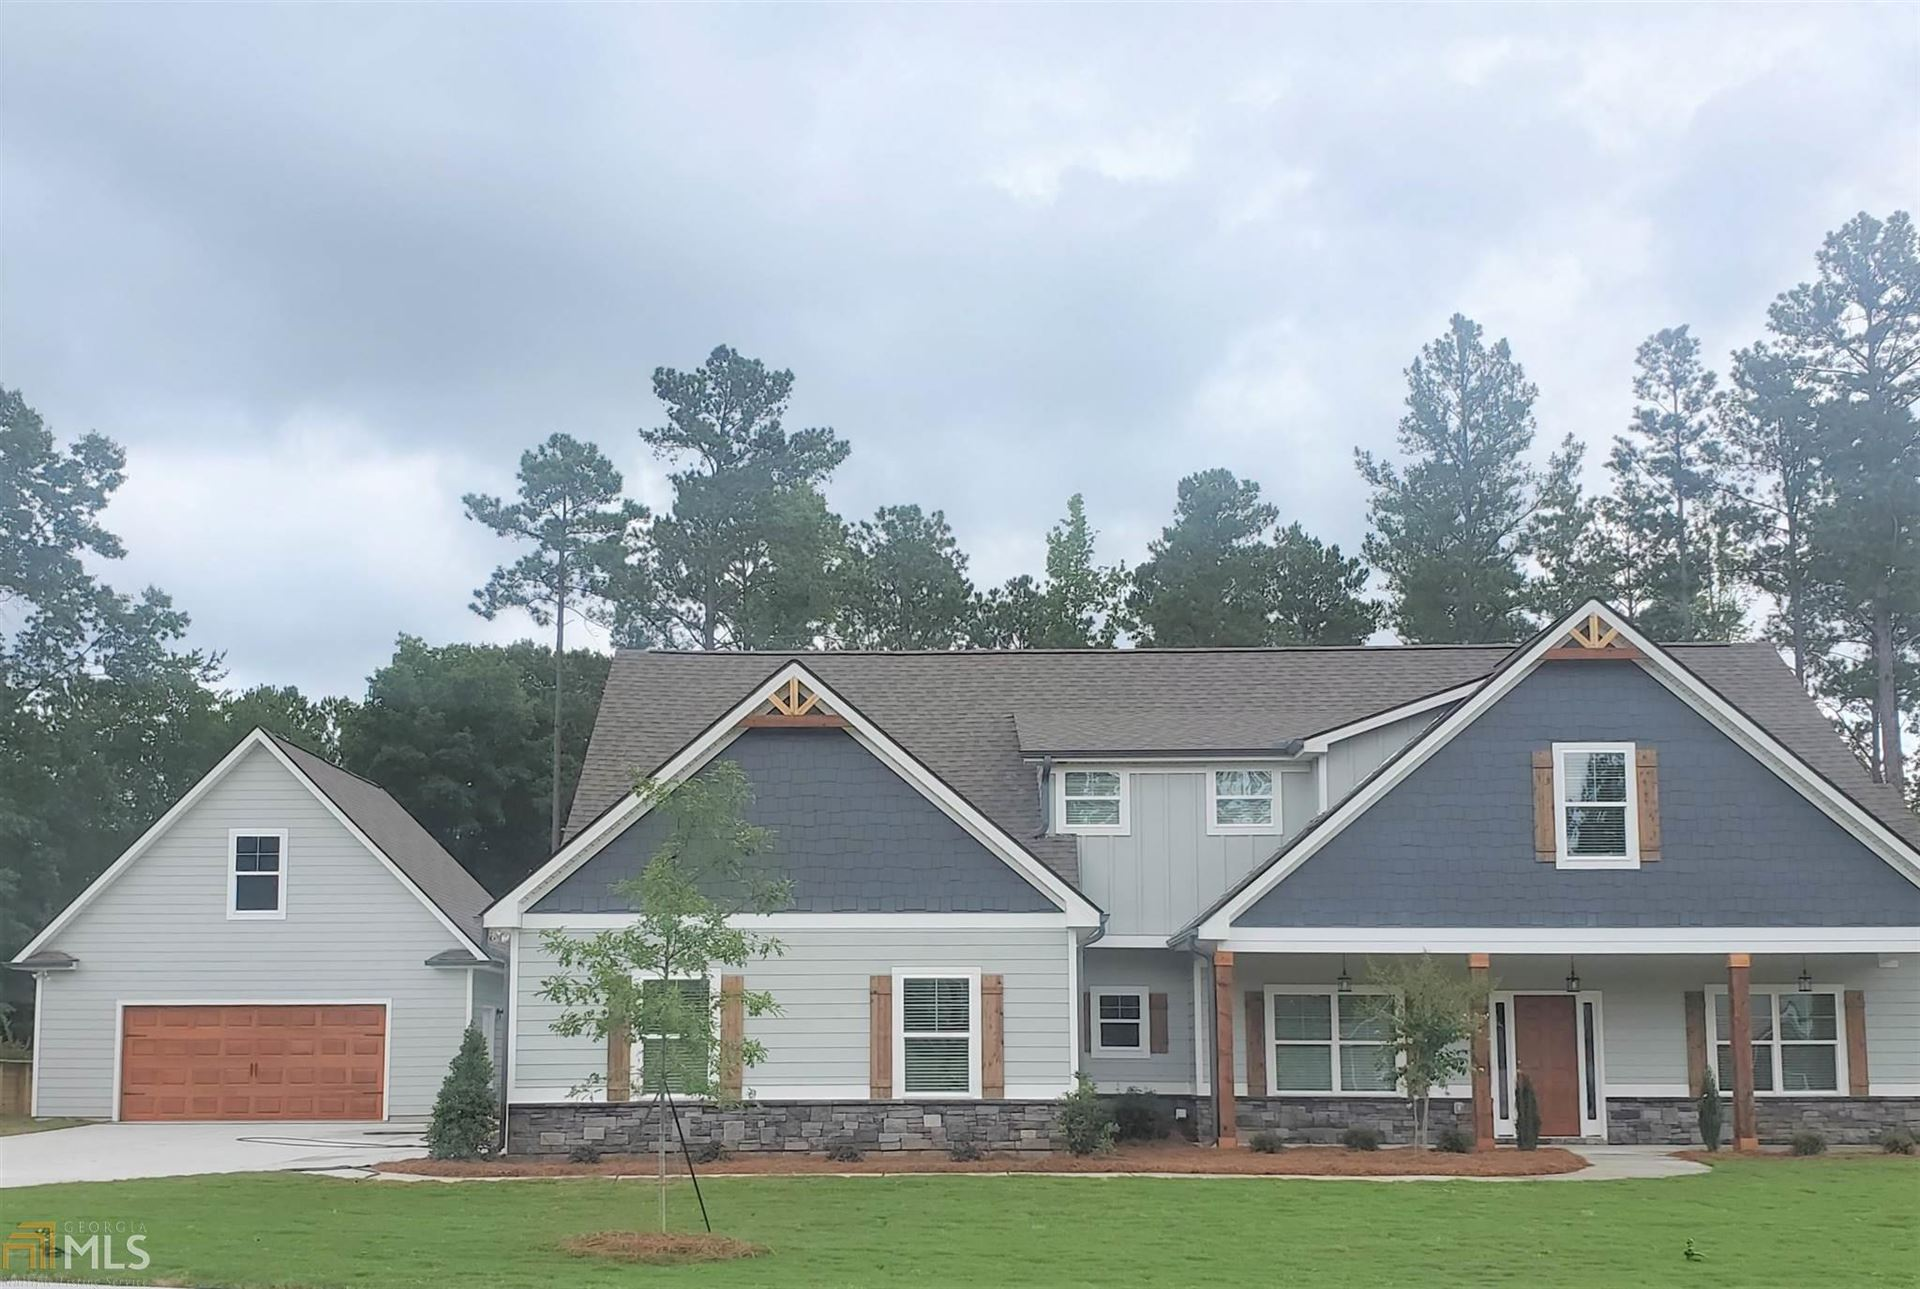 4-4 Newberry Estates Xing, Senoia, GA 30276 - MLS#: 8855986